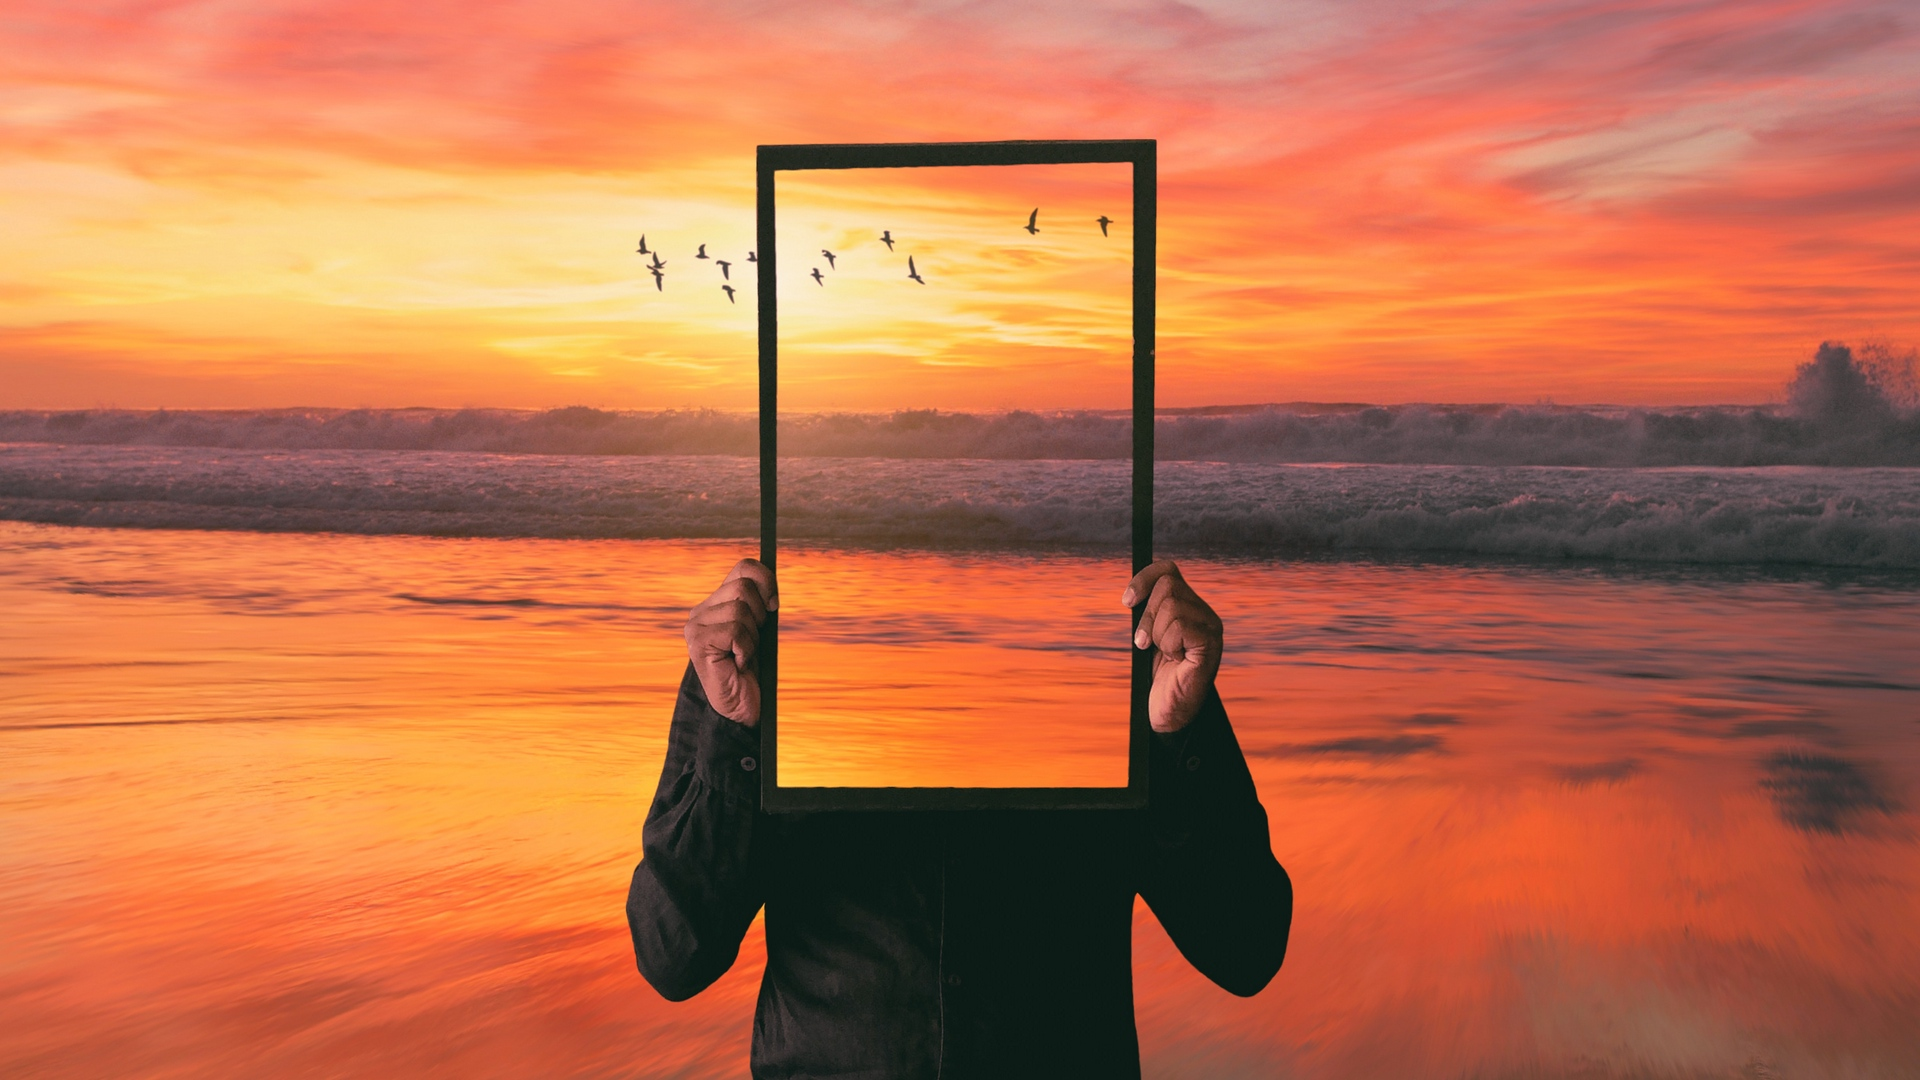 mirror wallpaper 70447